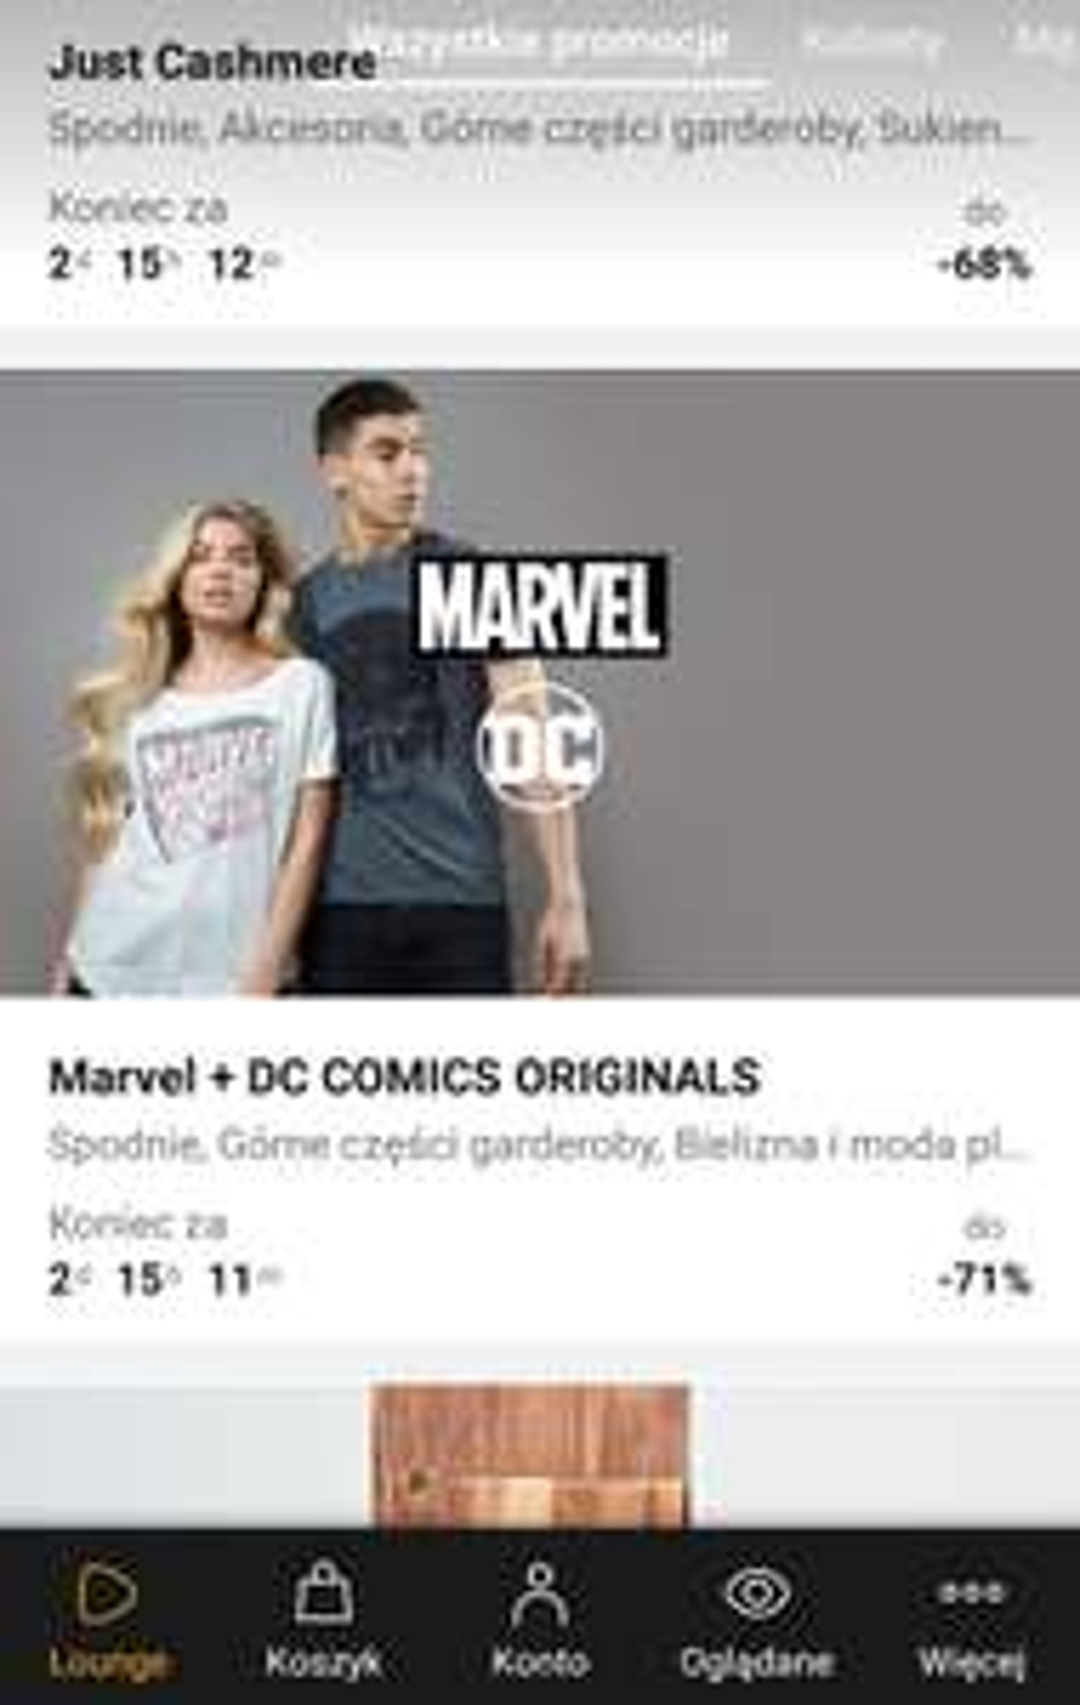 Zalando Lounge - Kolekcja Marvel & DC do -71%